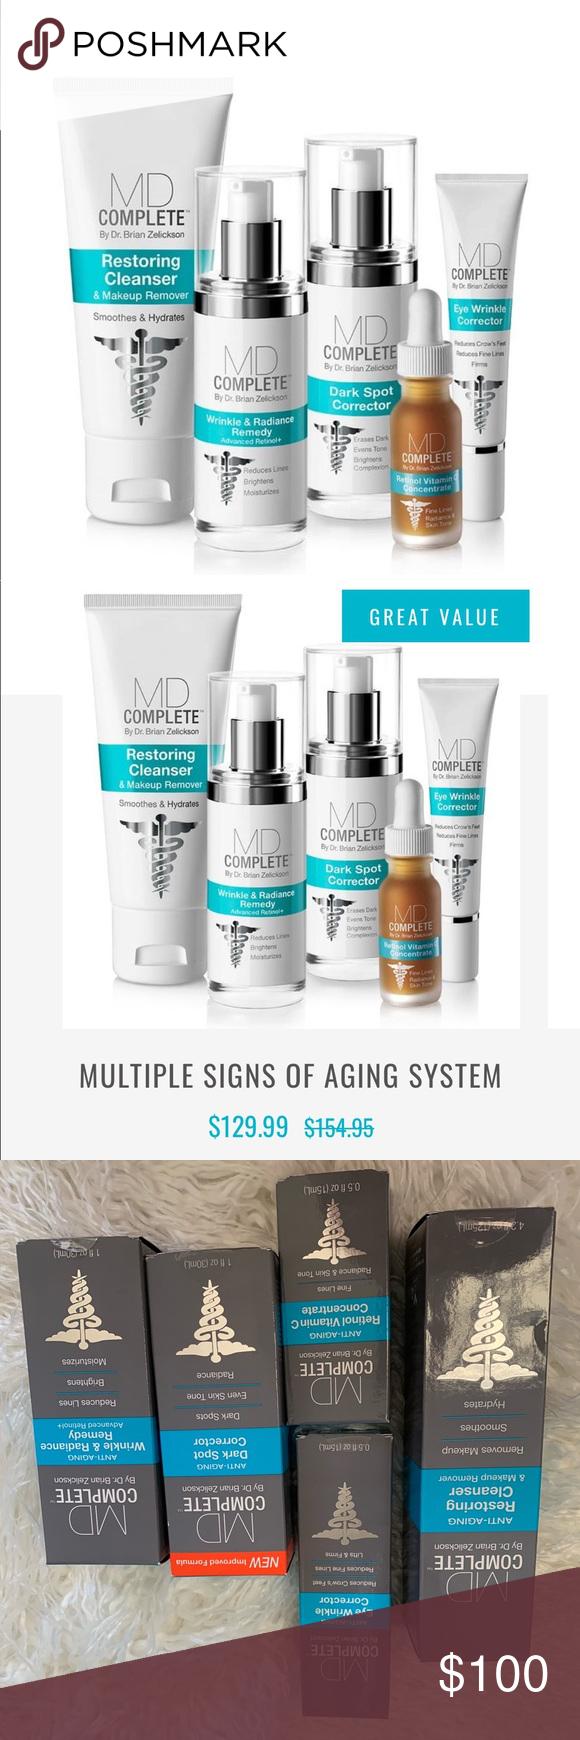 Md Complete Retinol Anti Aging Skincare Aging Skin Care Anti Aging Skin Care Skin Care